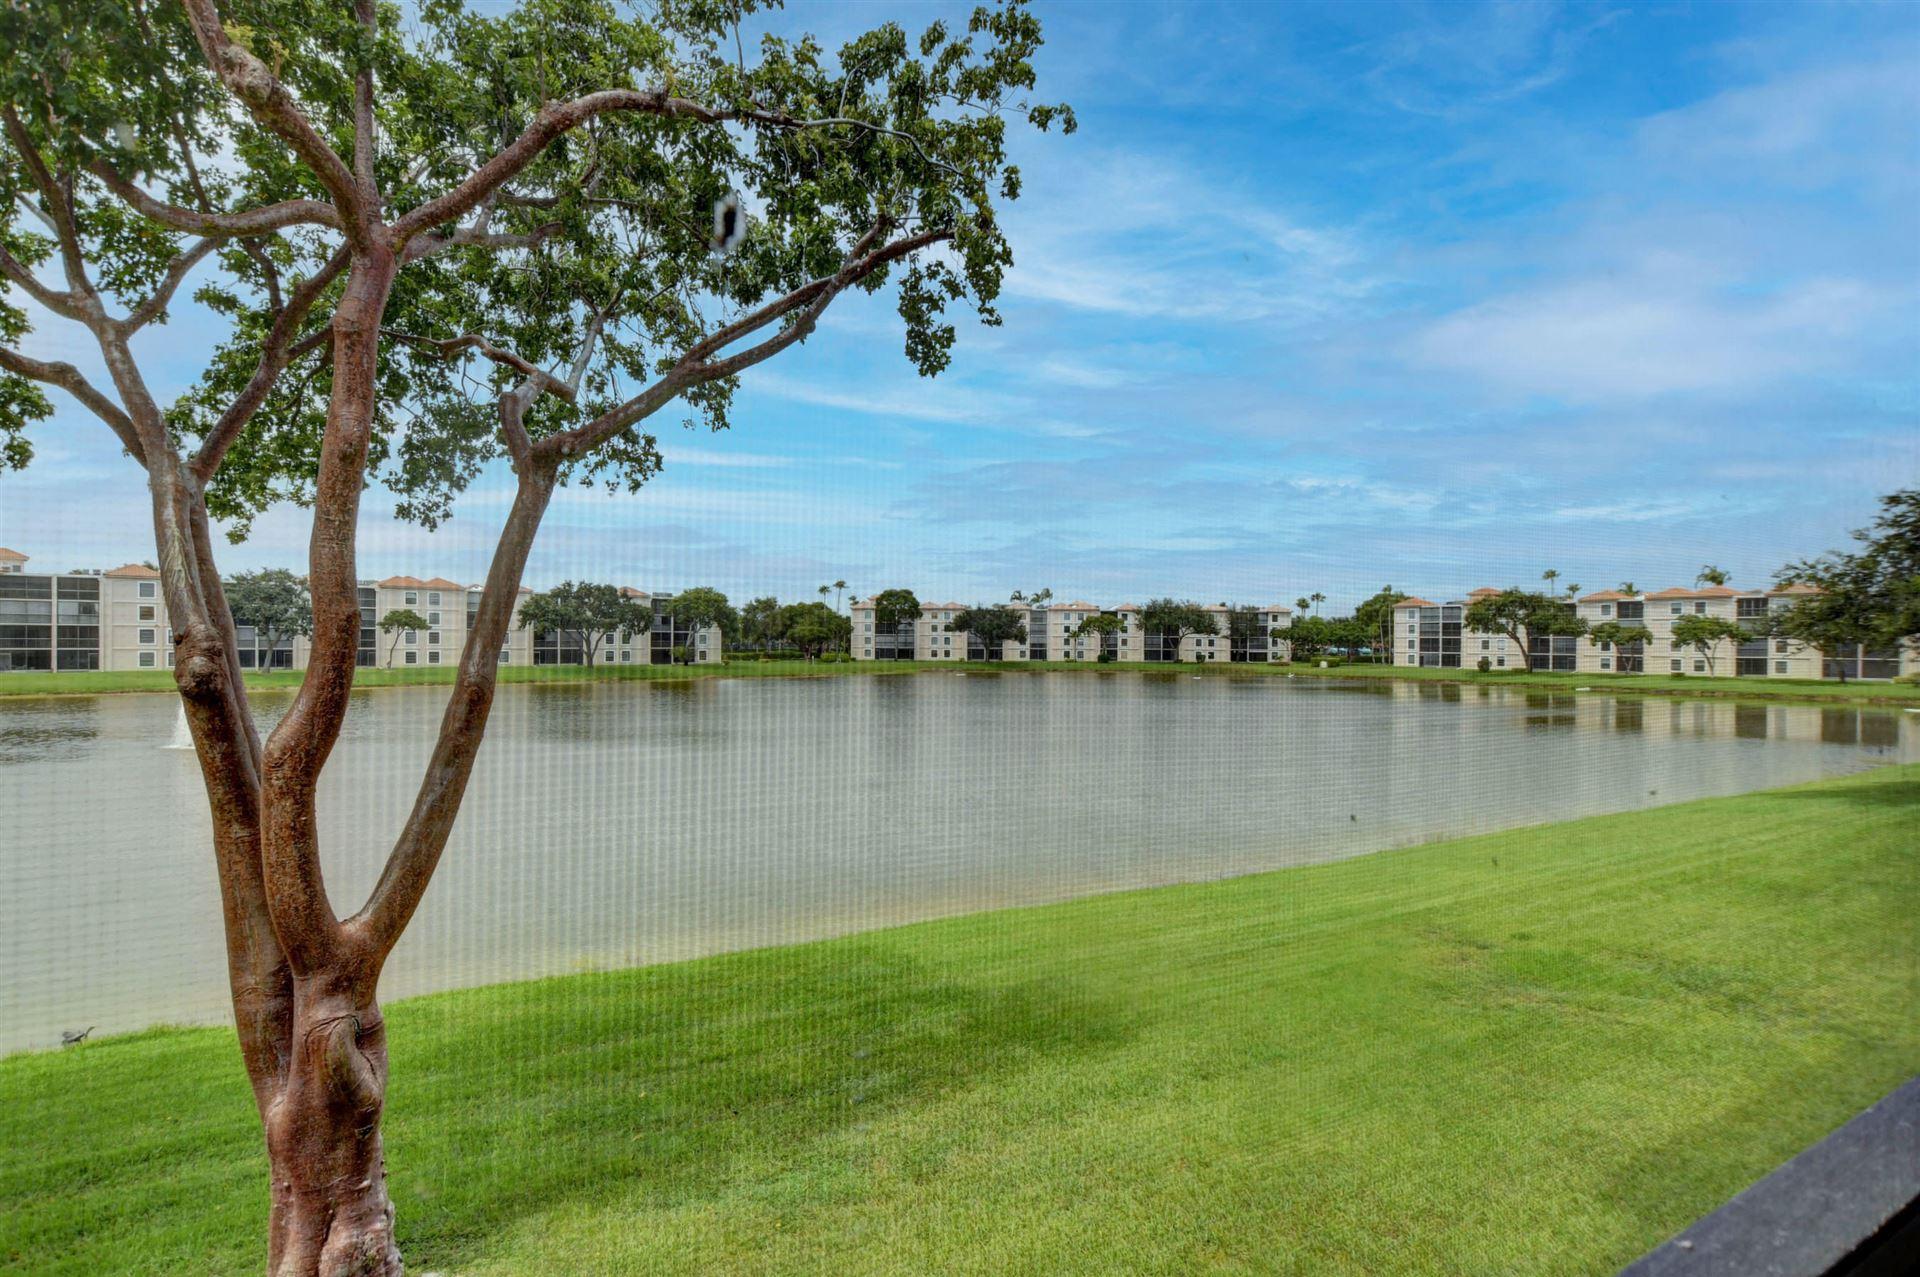 6193 Pointe Regal Circle #206, Delray Beach, FL 33484 - MLS#: RX-10740764